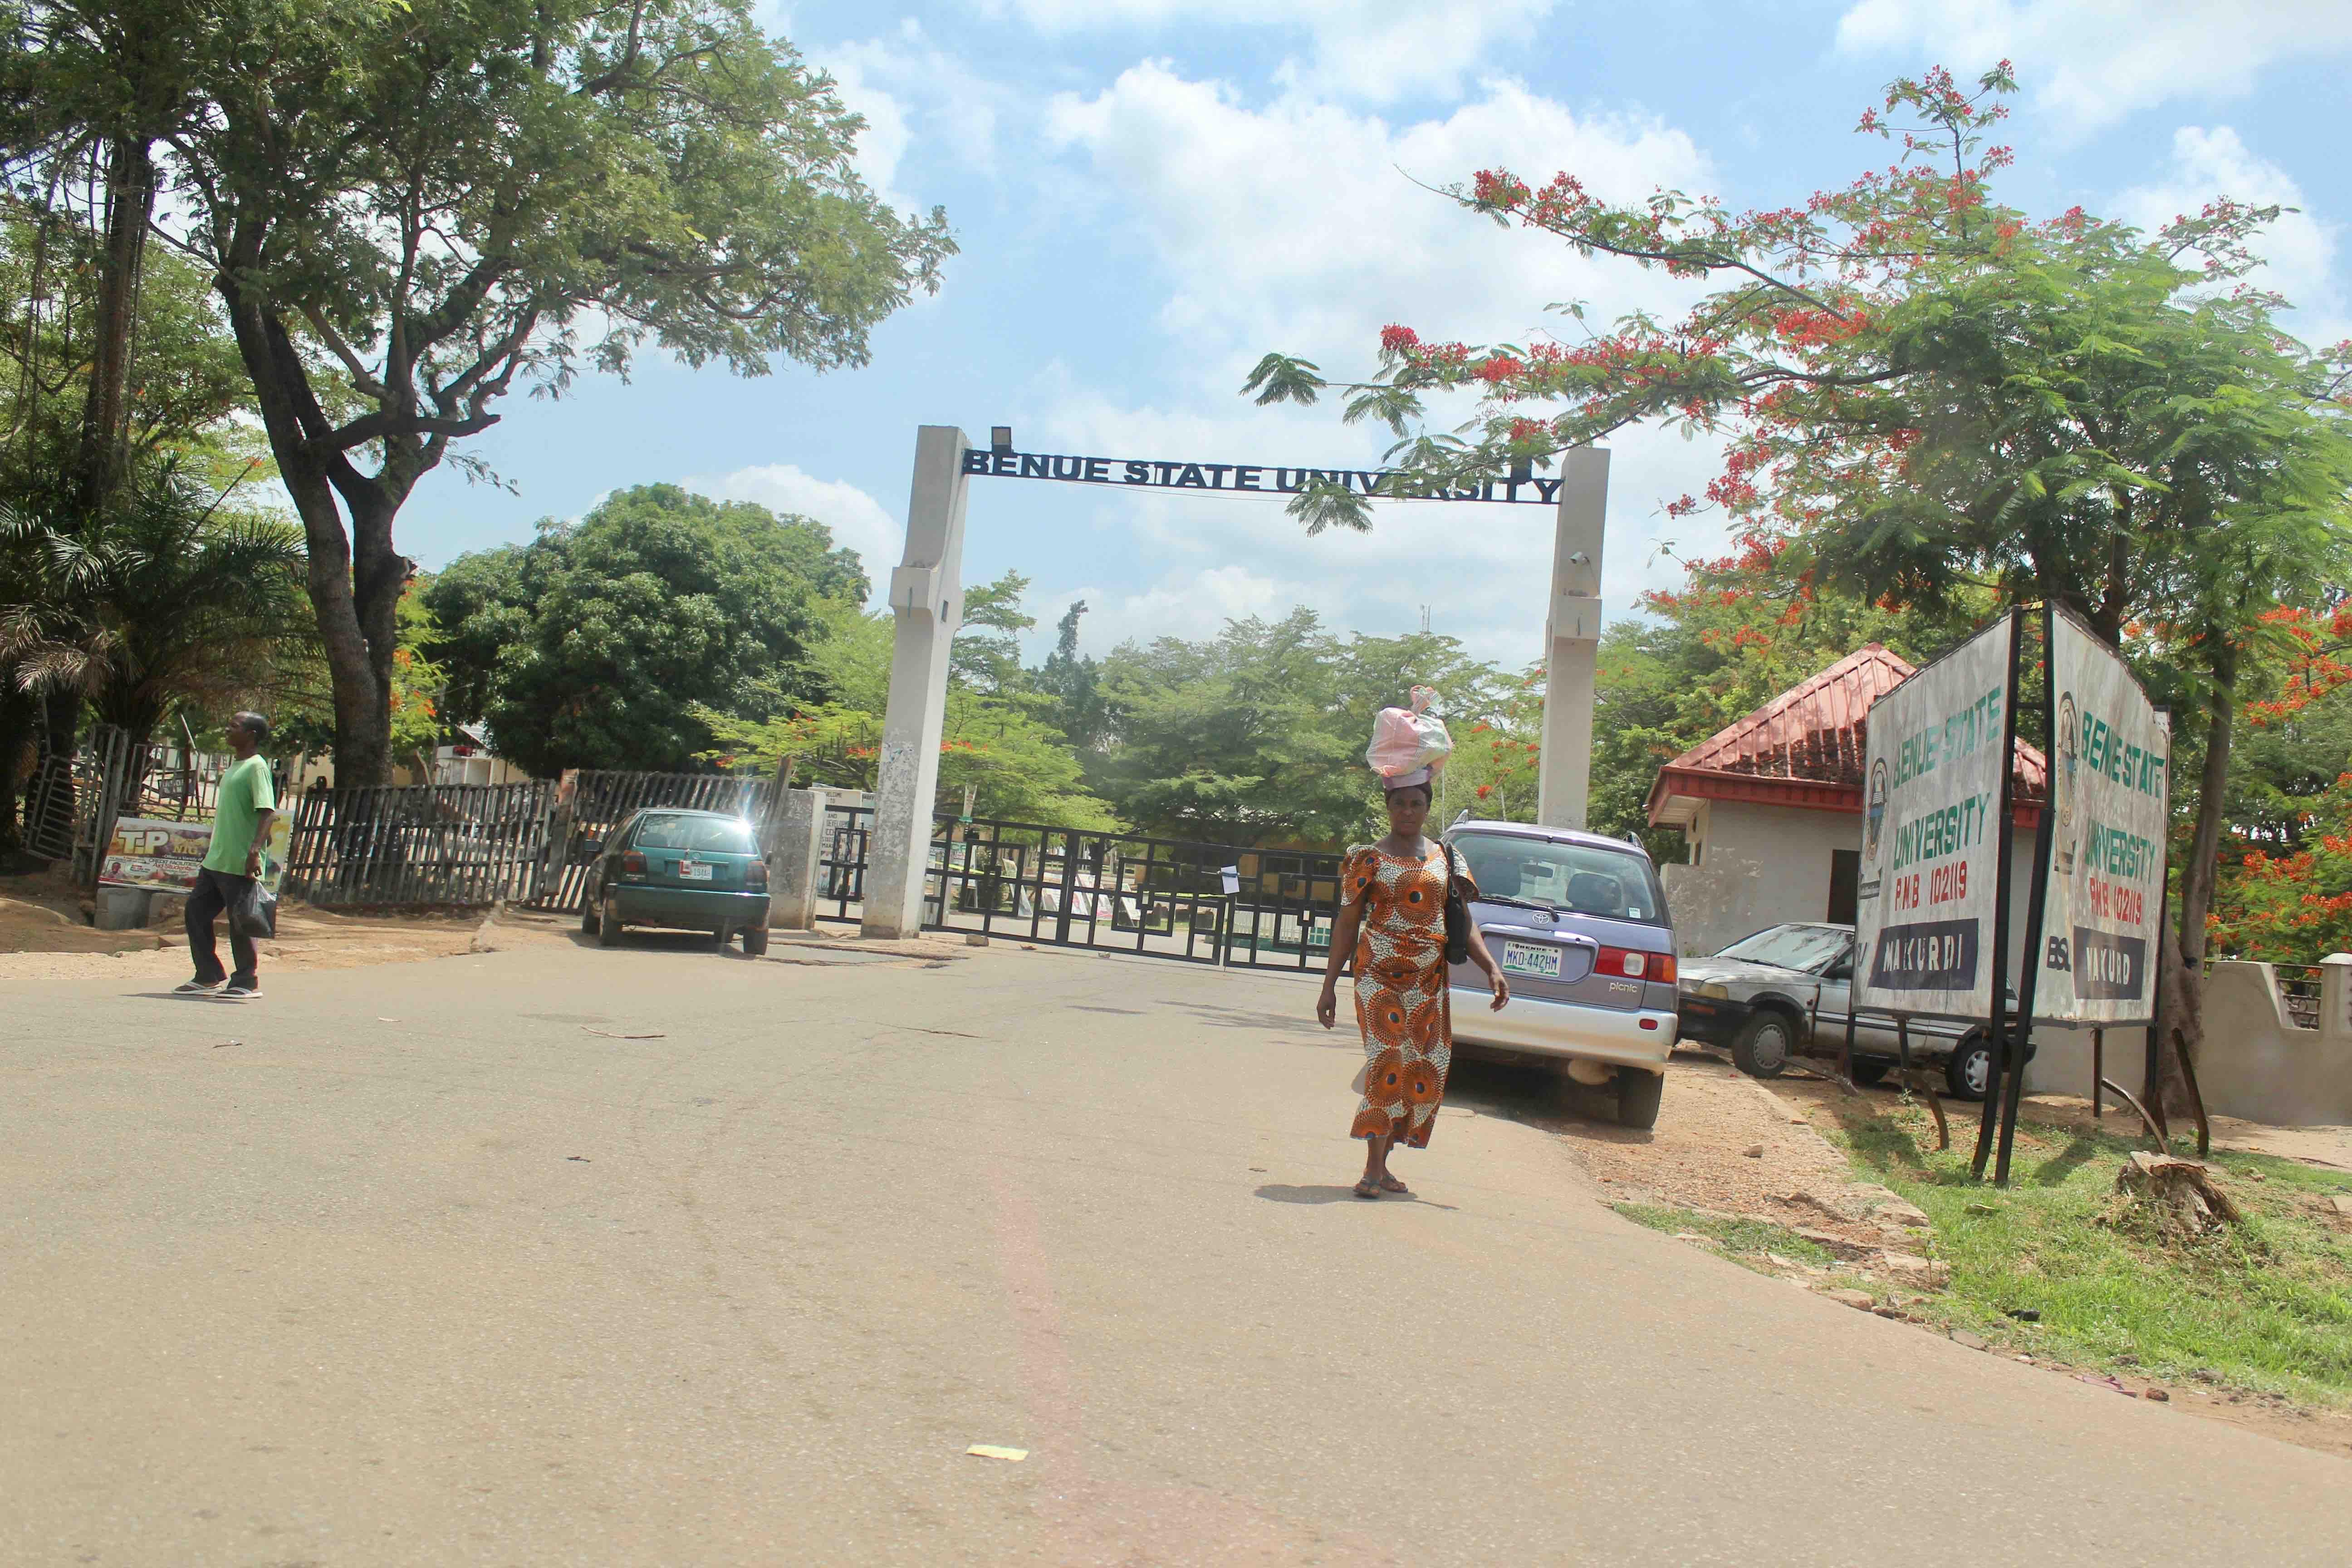 Benue State University, Makurdi, Benue State, Nigeria. #JujuFilms